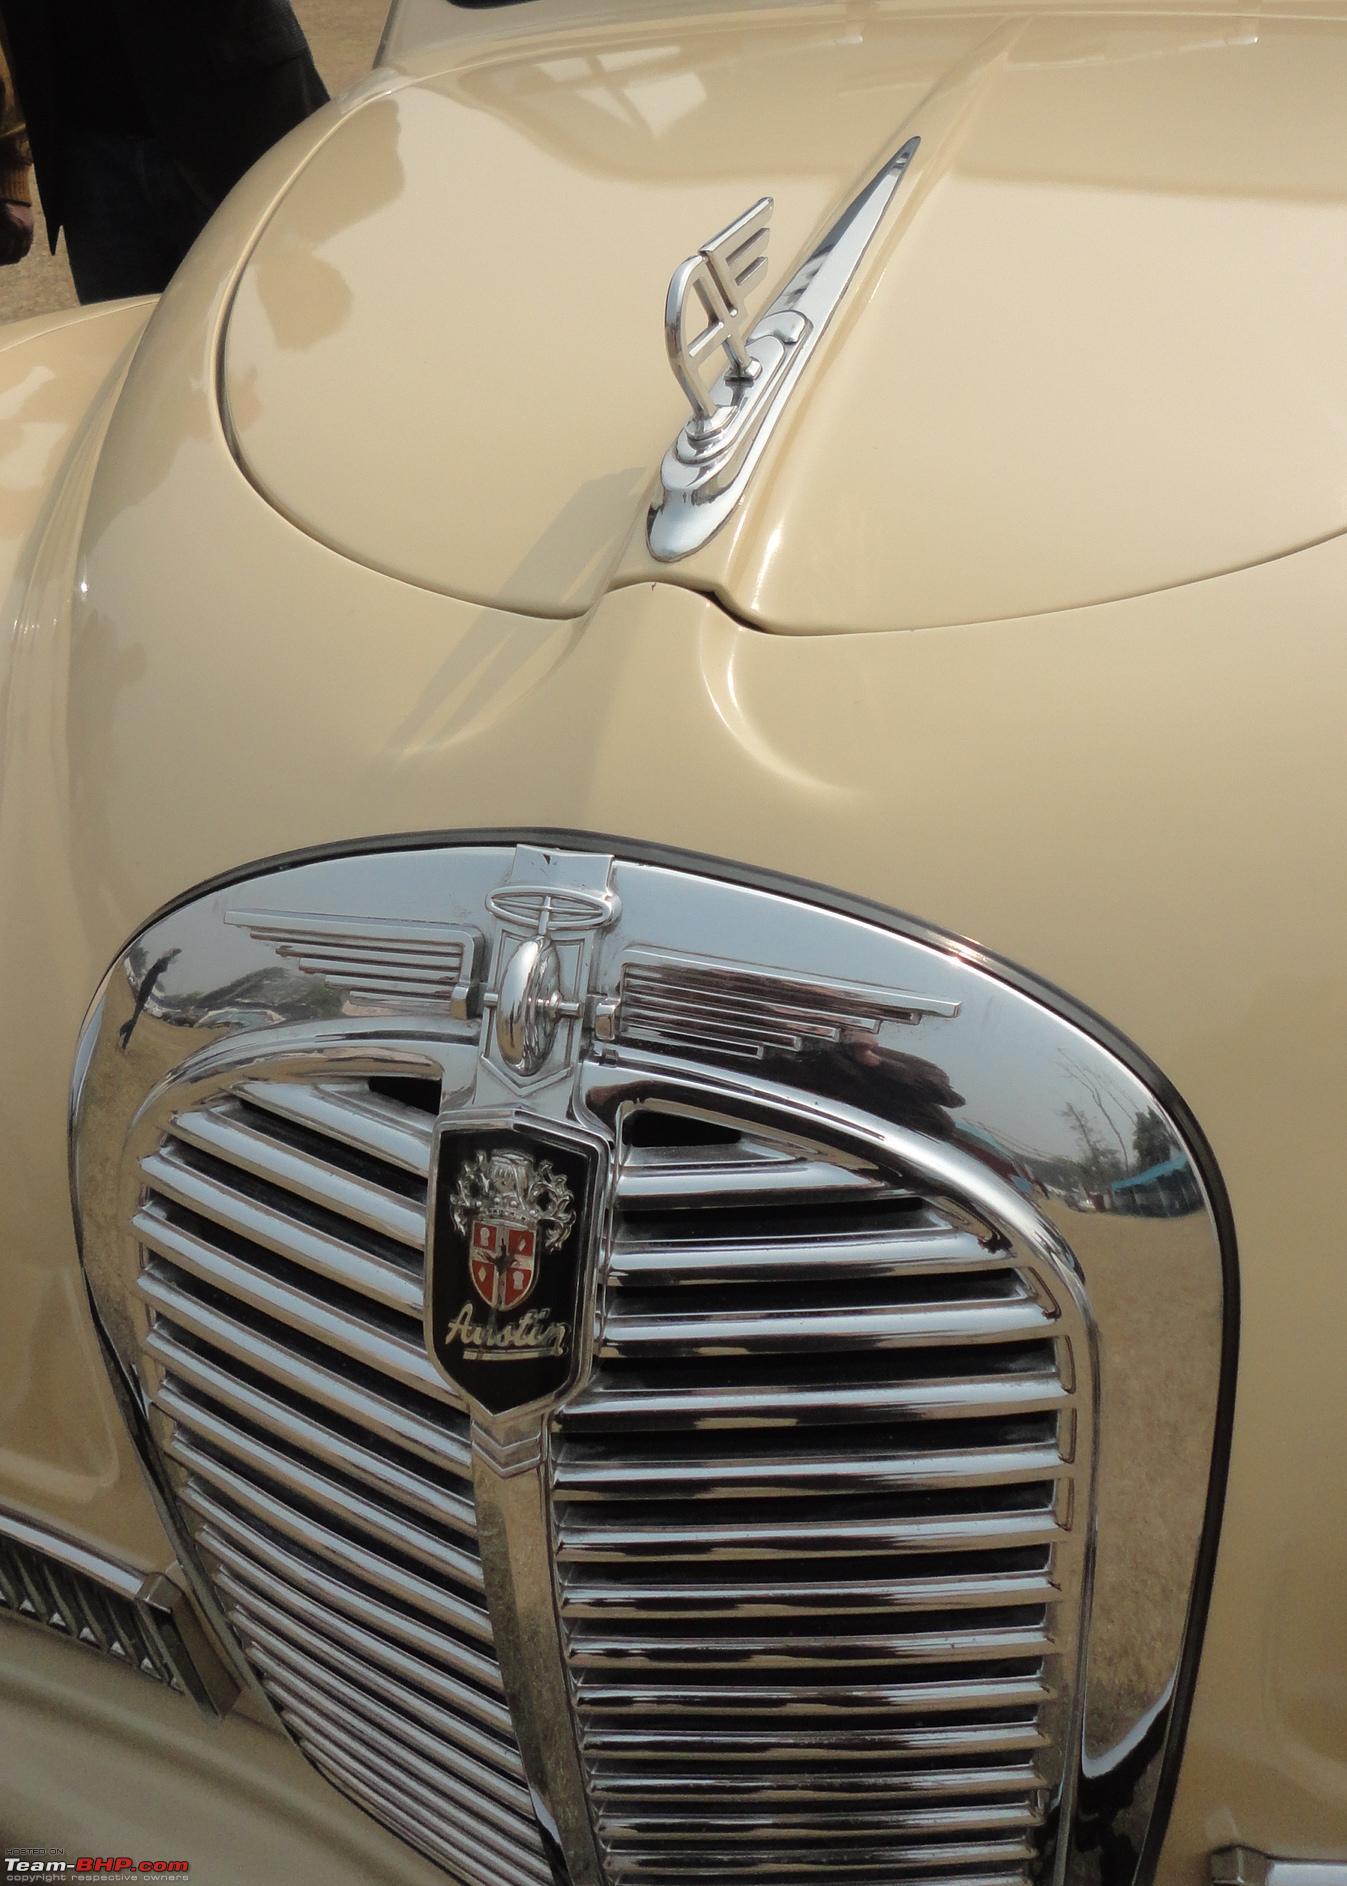 List of Vintage / Classic Car Restorers in India - Team-BHP